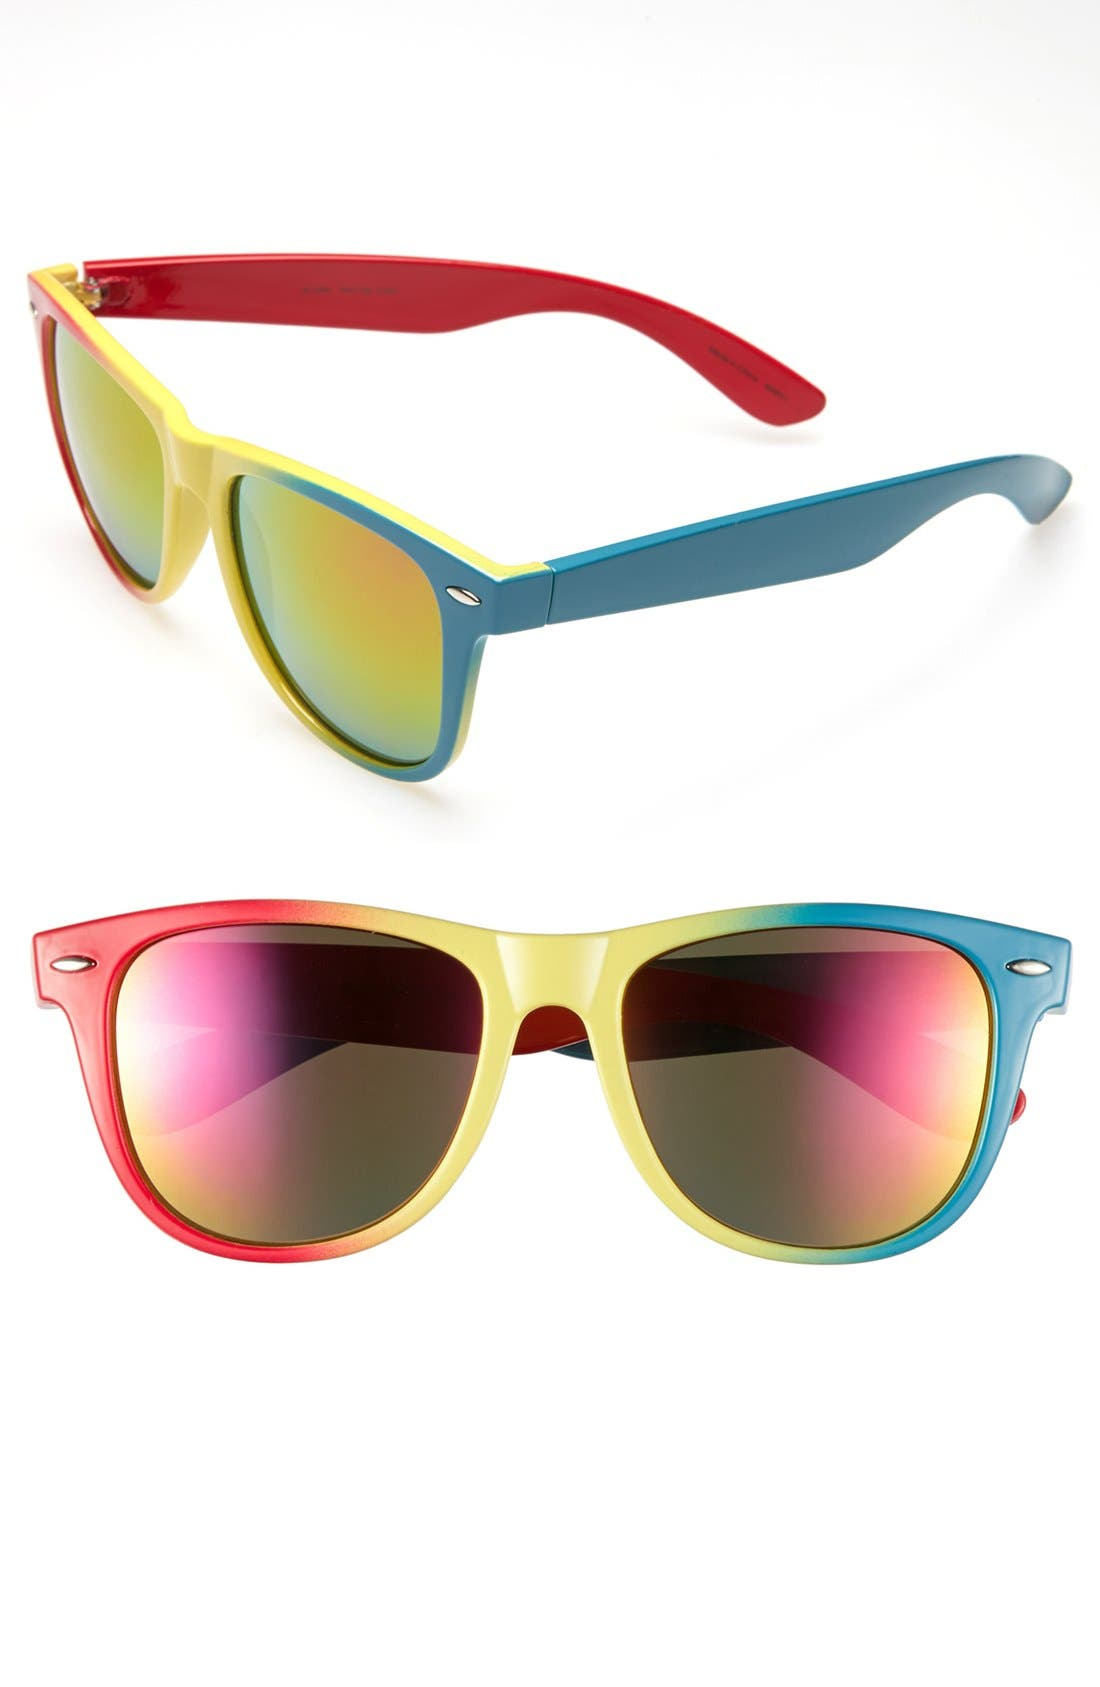 Alternate Image 1 Selected - Outlook Eyewear 'Alumni' 54mm Sunglasses